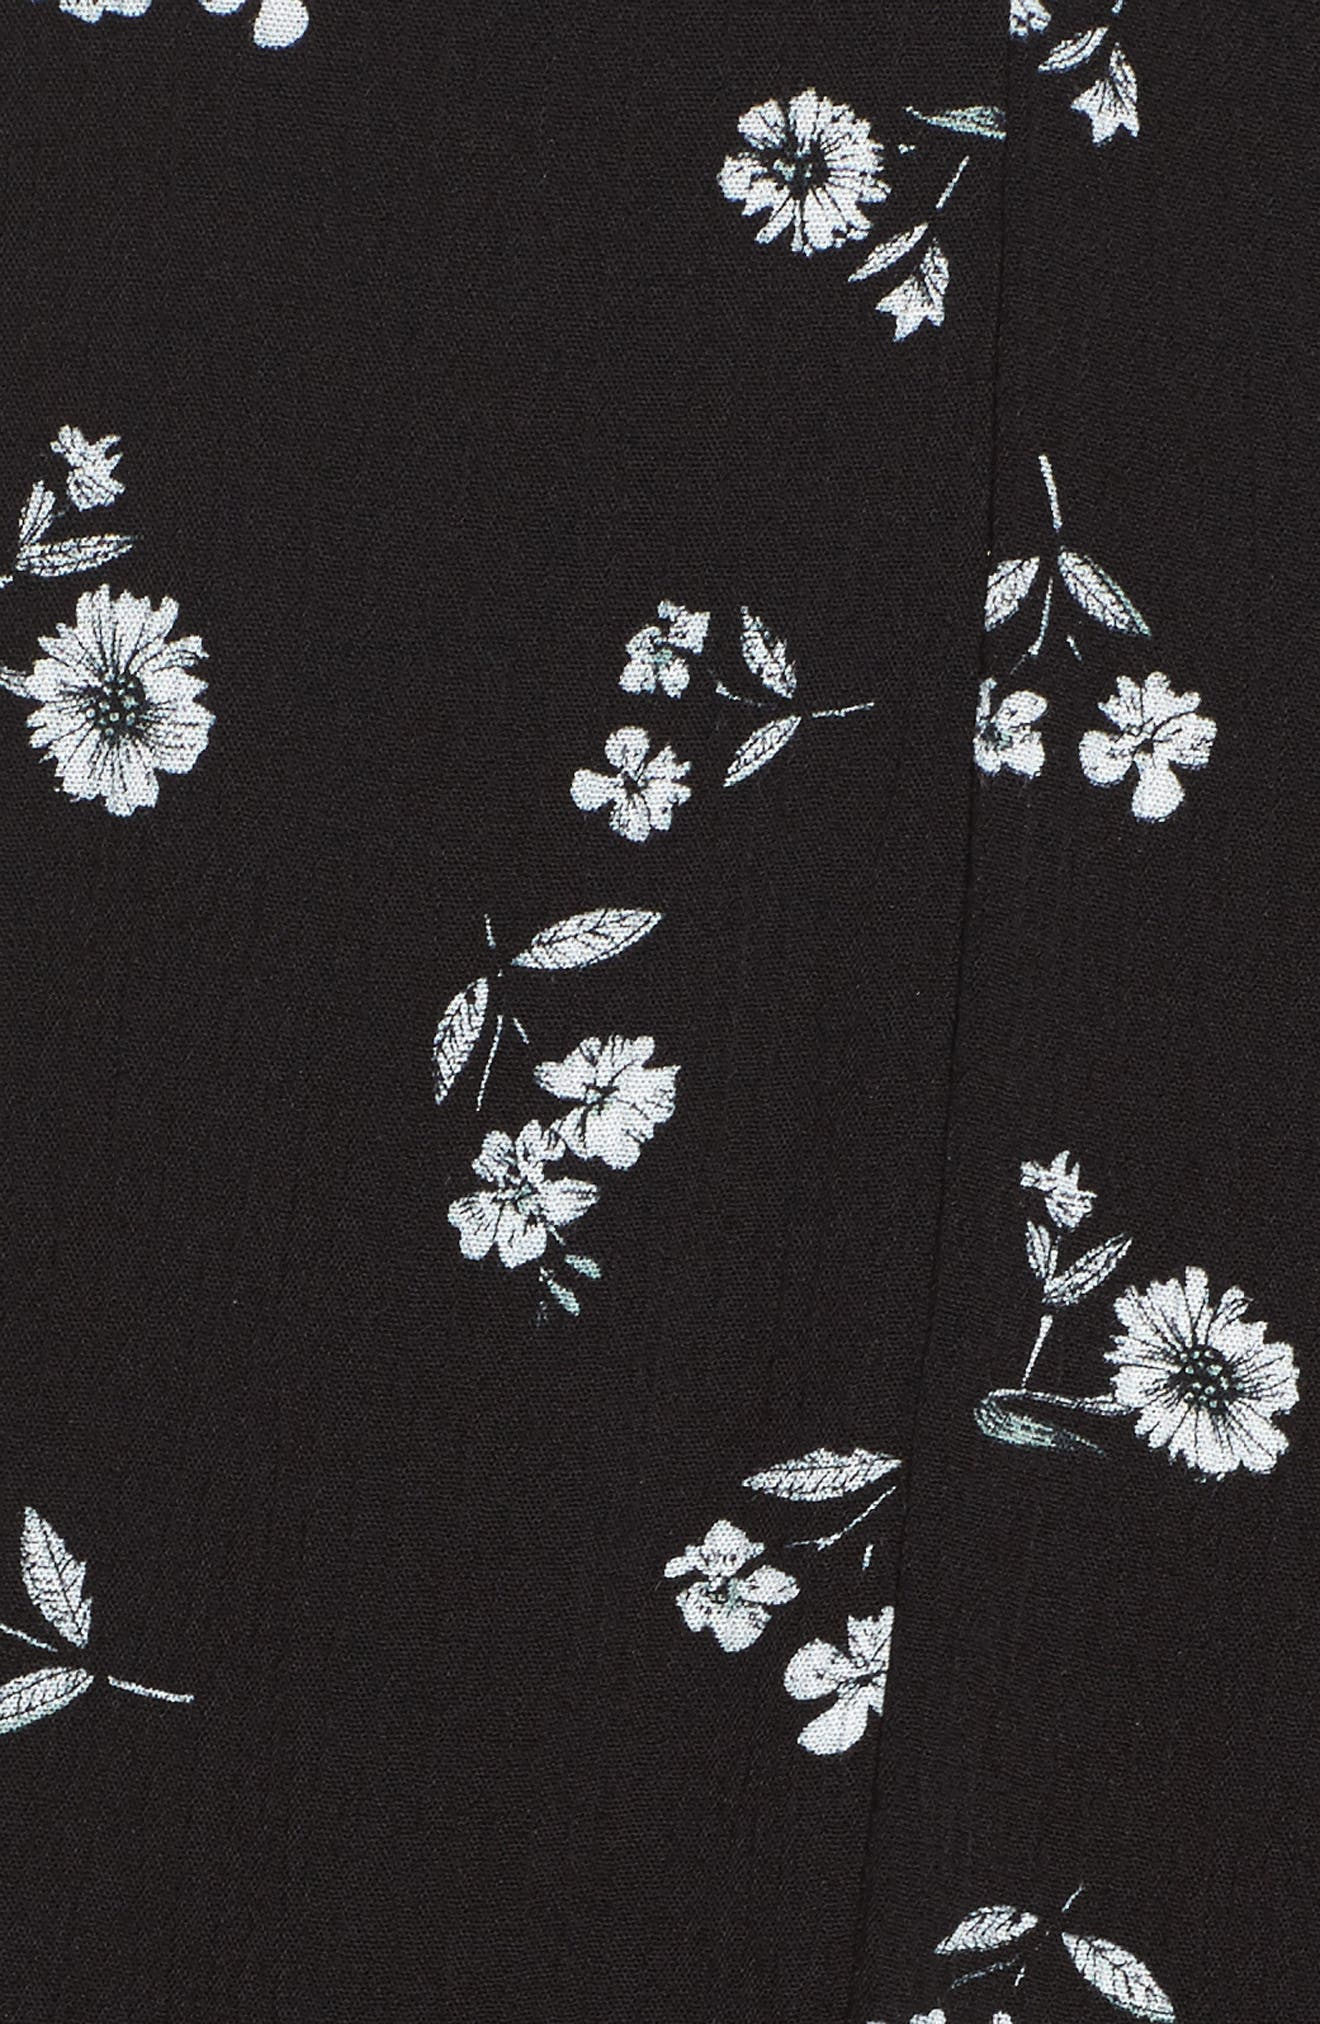 Bell Sleeve Floral Shift Dress,                             Alternate thumbnail 5, color,                             016